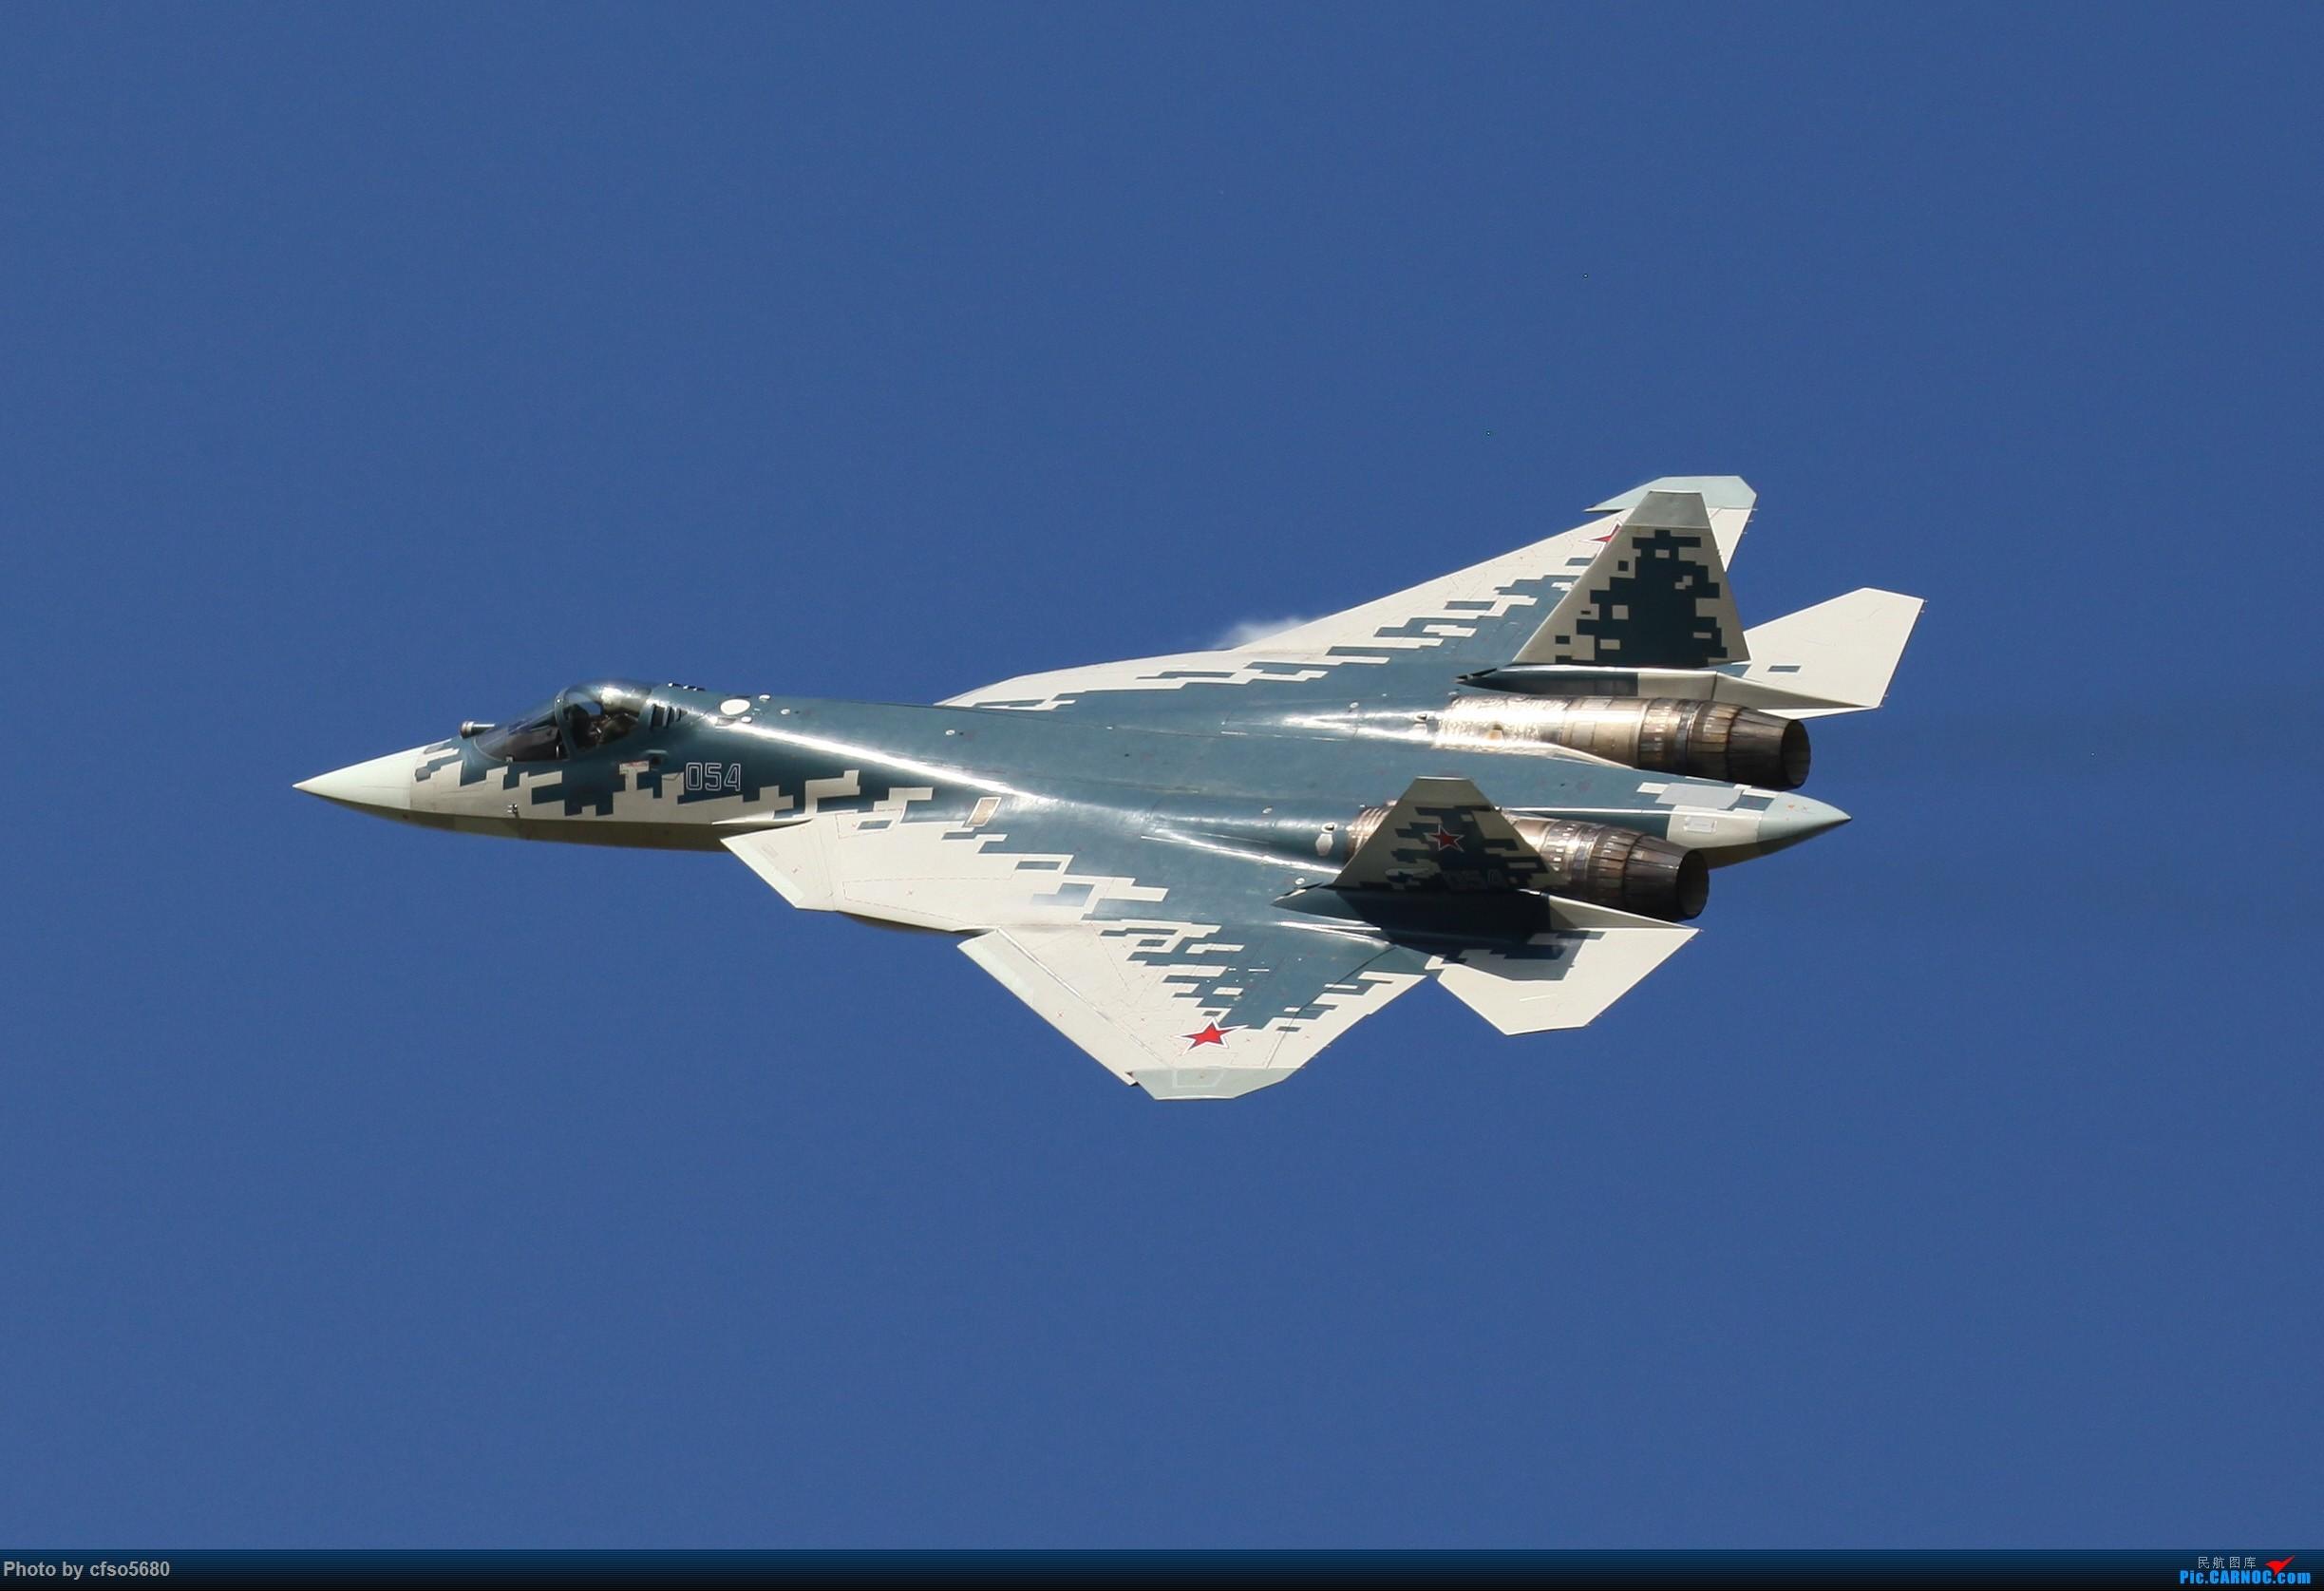 Re:[原创]2019莫斯科航展-su57首次飞行展示 SU57 54 茹科夫斯基